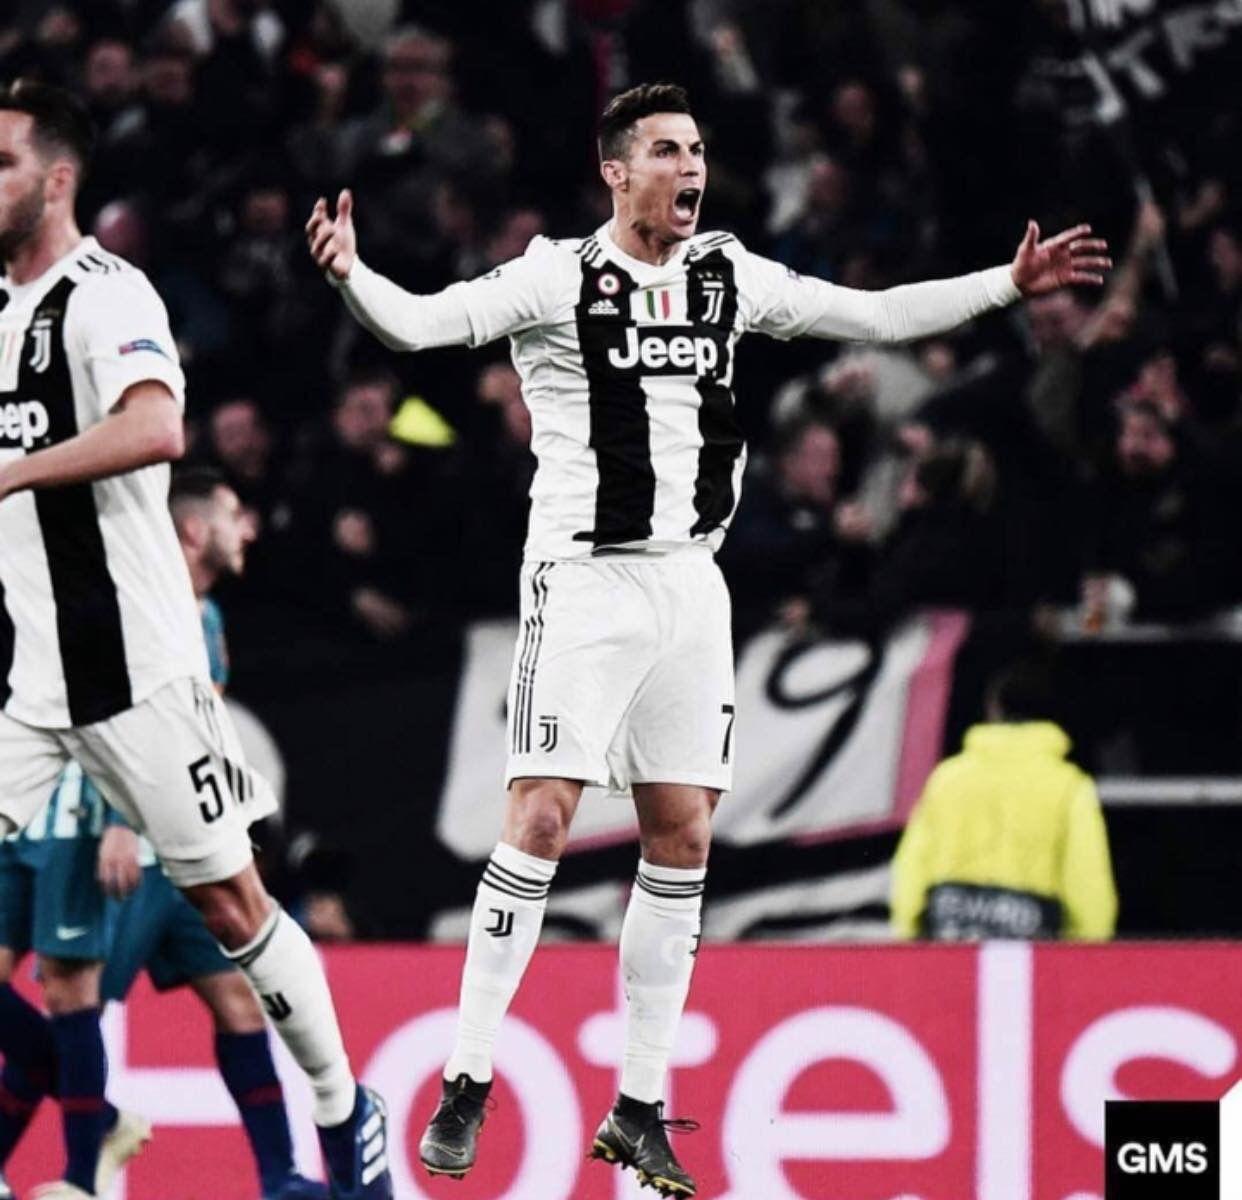 c7 ronaldo soccerpassion Ronaldo, Champions league